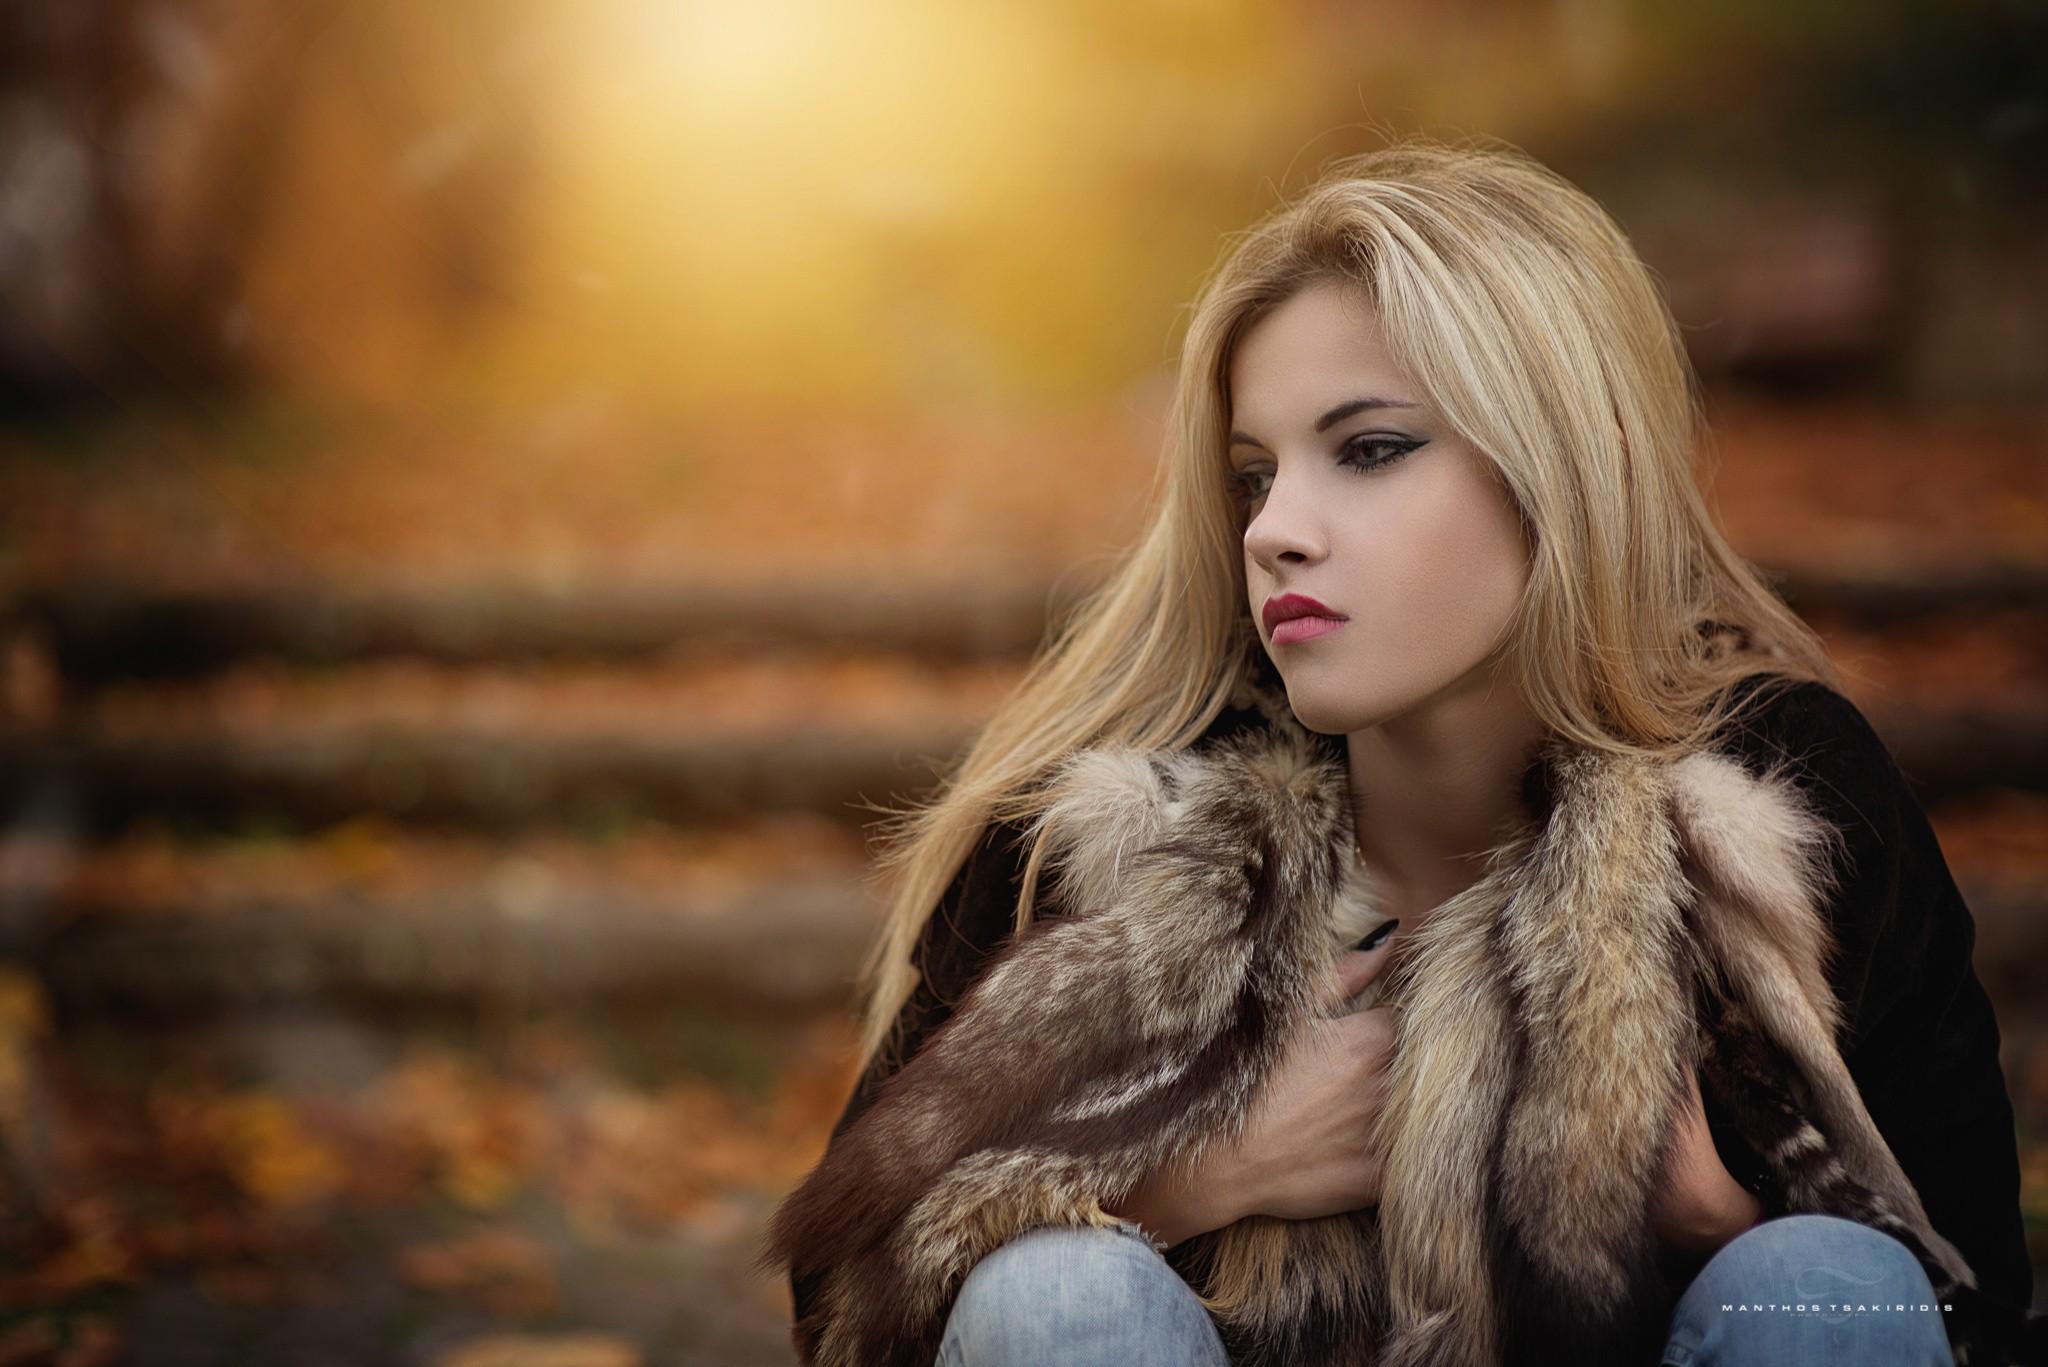 Hair Style Jeans: Wallpaper : Fall, Women Outdoors, Model, Blonde, Long Hair